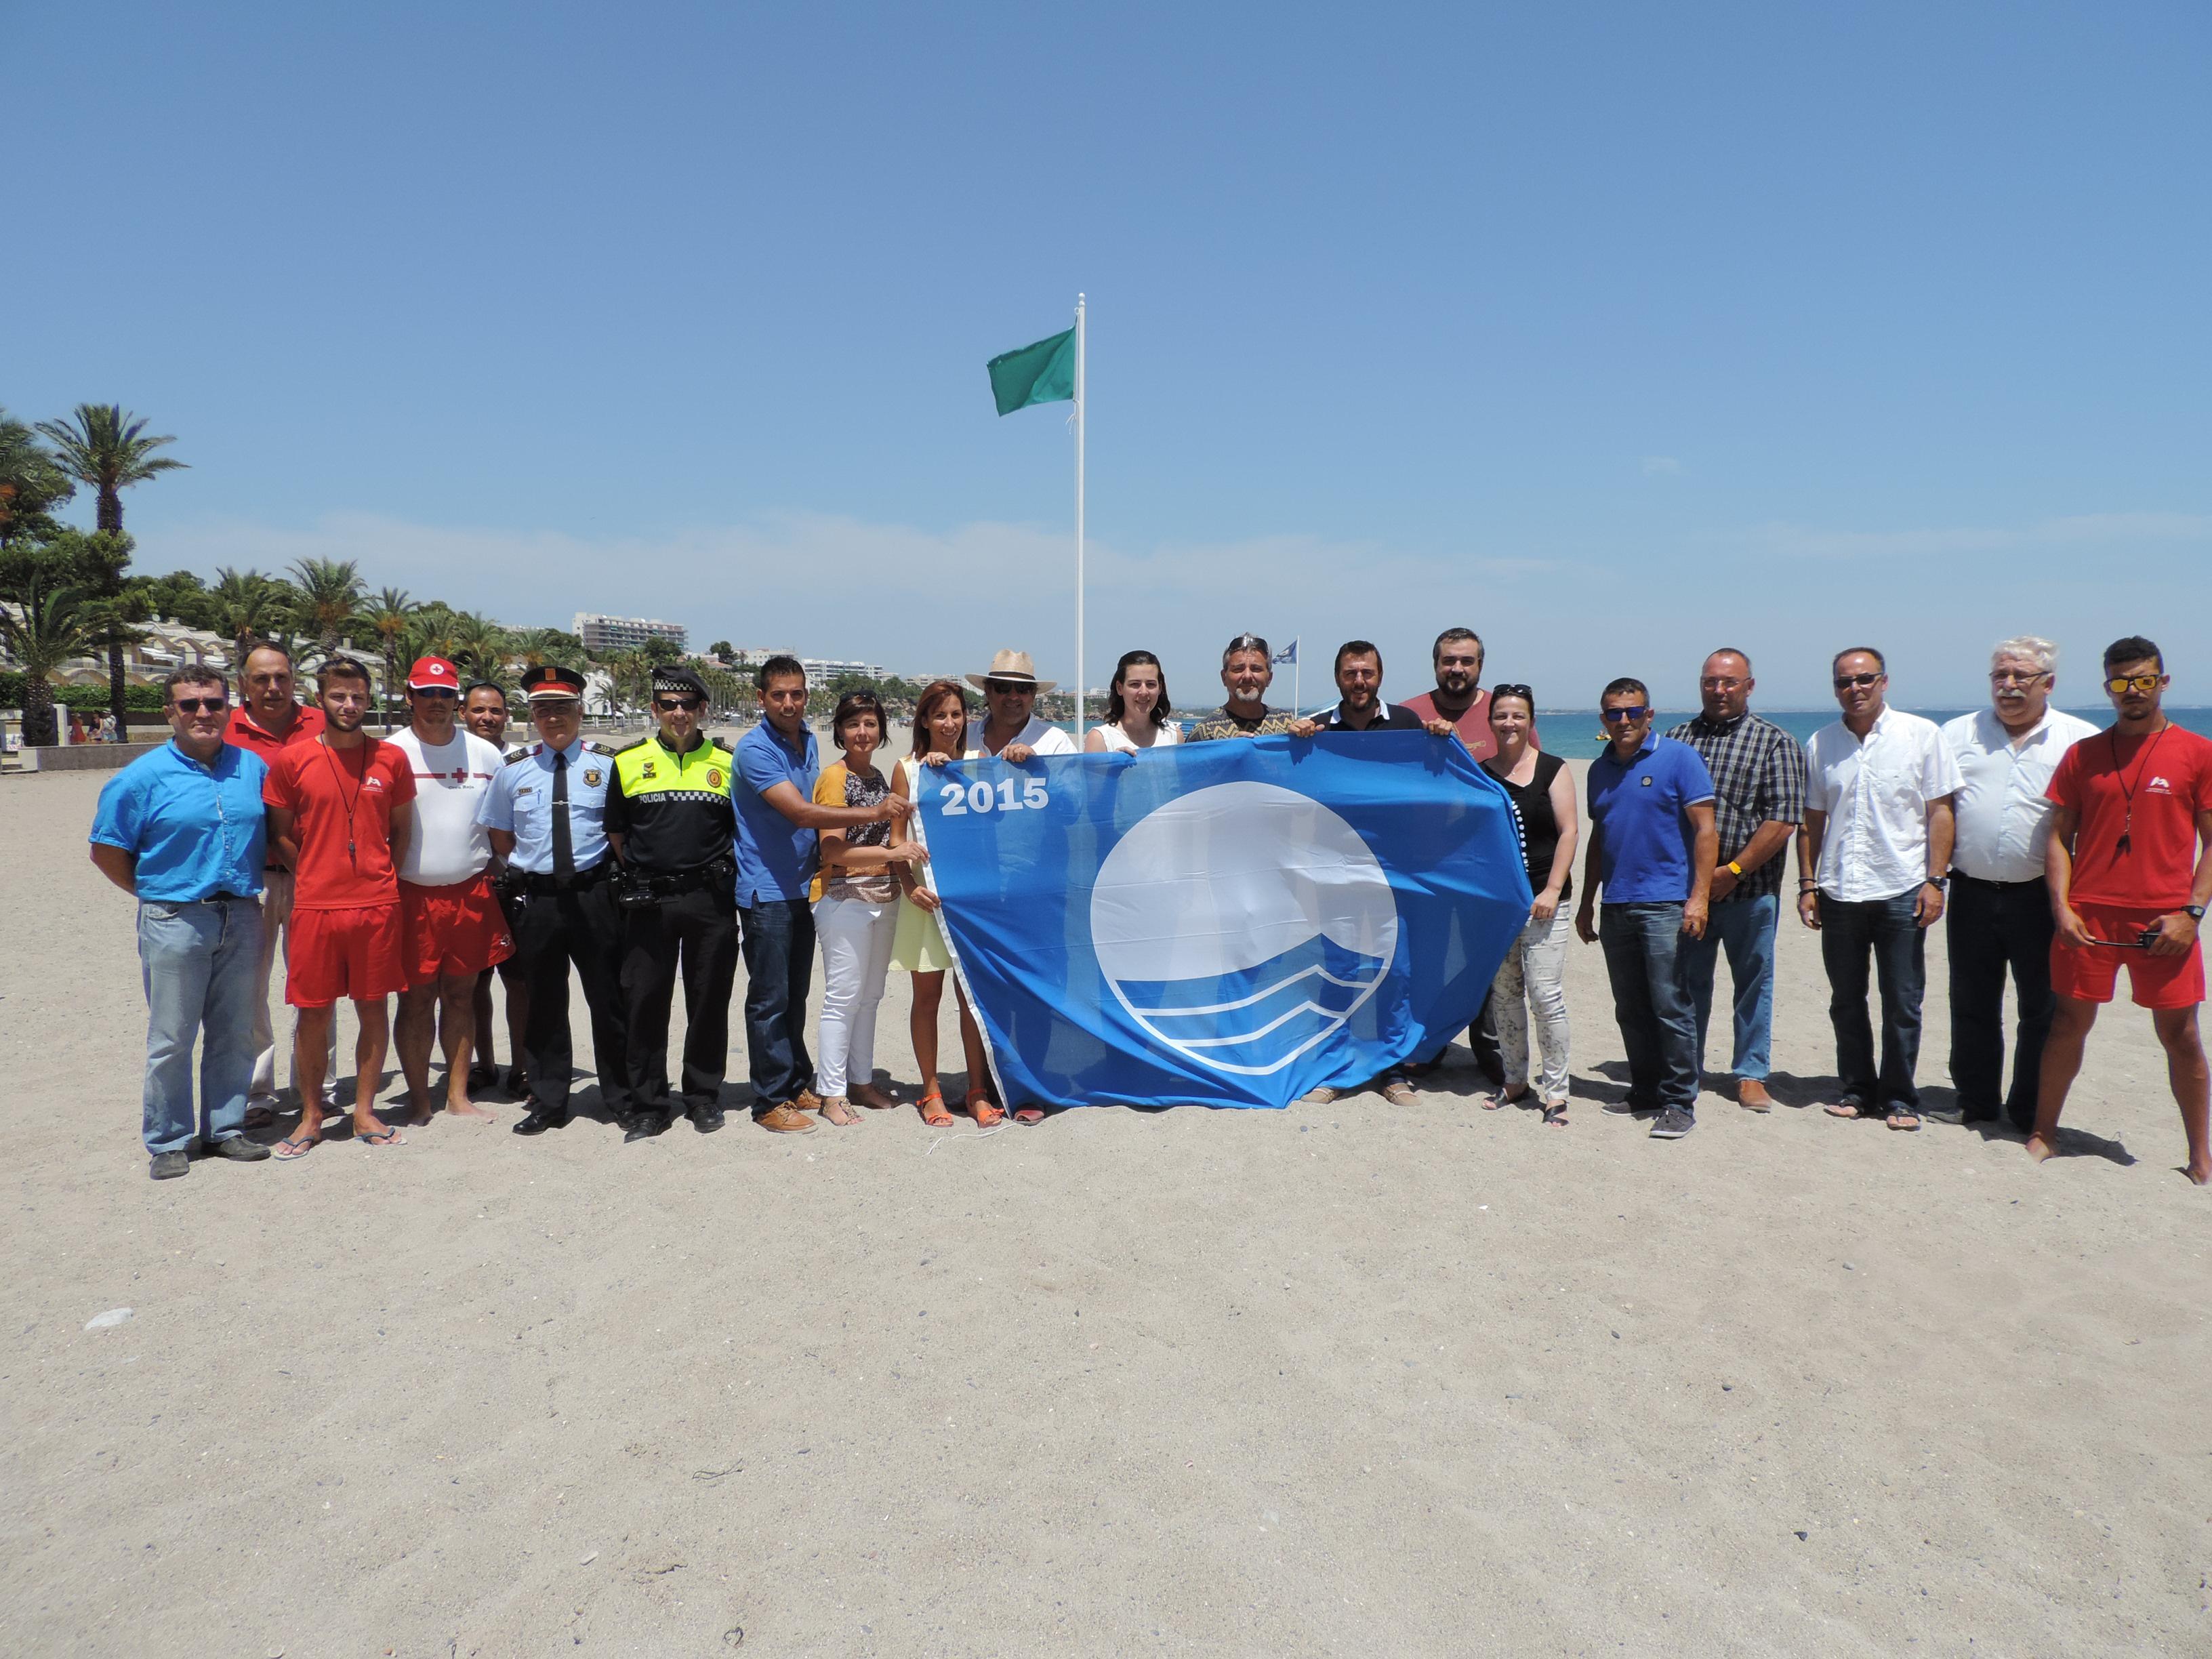 Bandera Azul 2015 en la playa Cristall